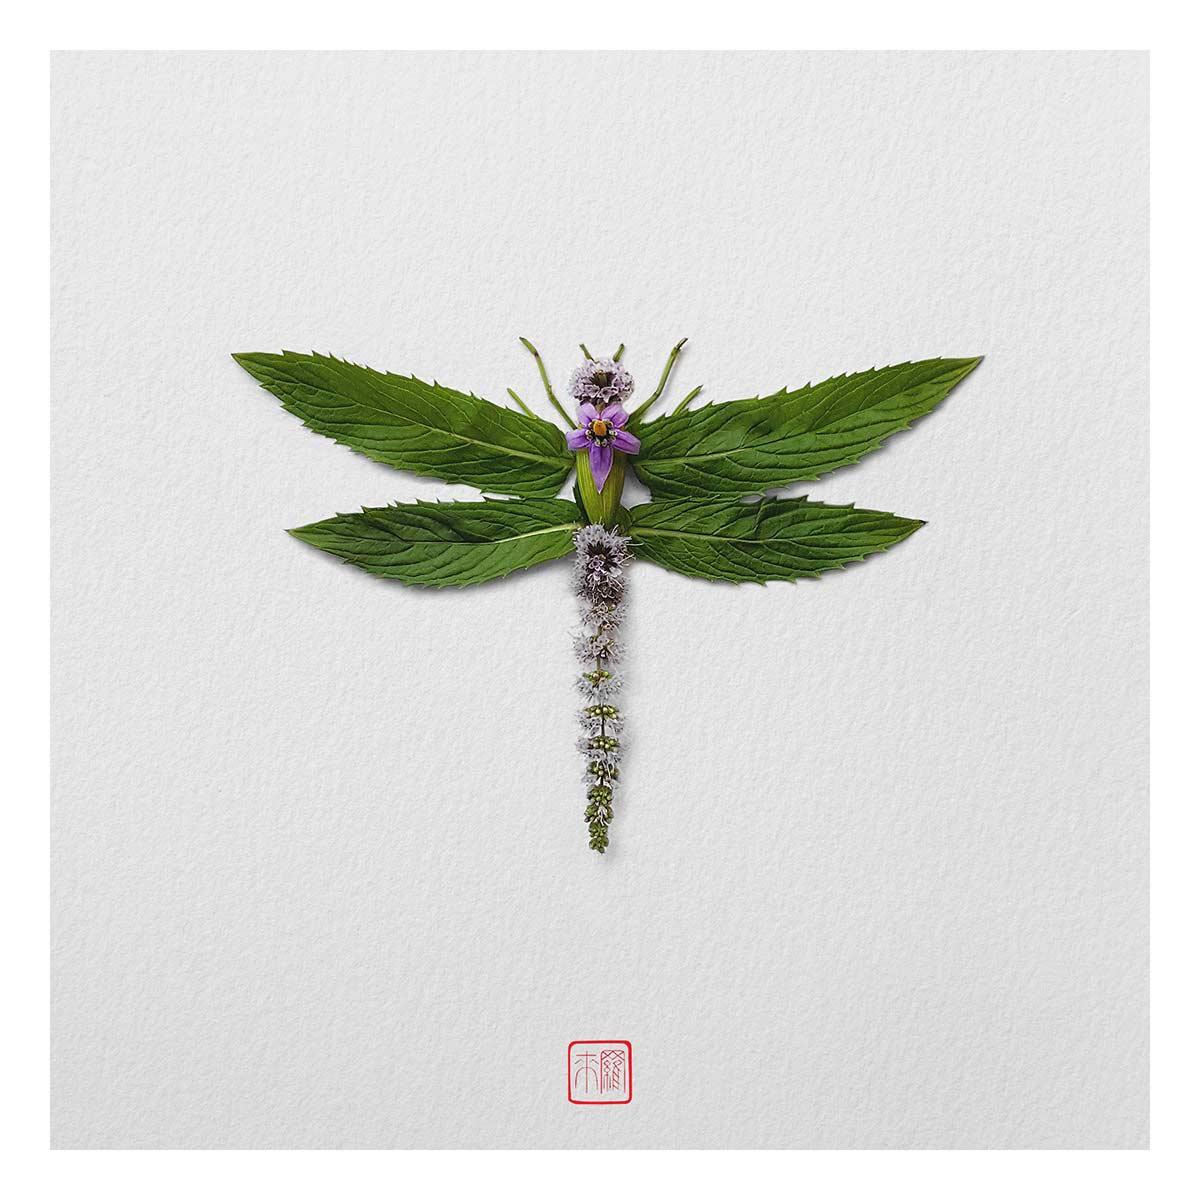 Tiere aus Blumenblüten Tiere-aus-blumenblueten-Raku-Inoue_08